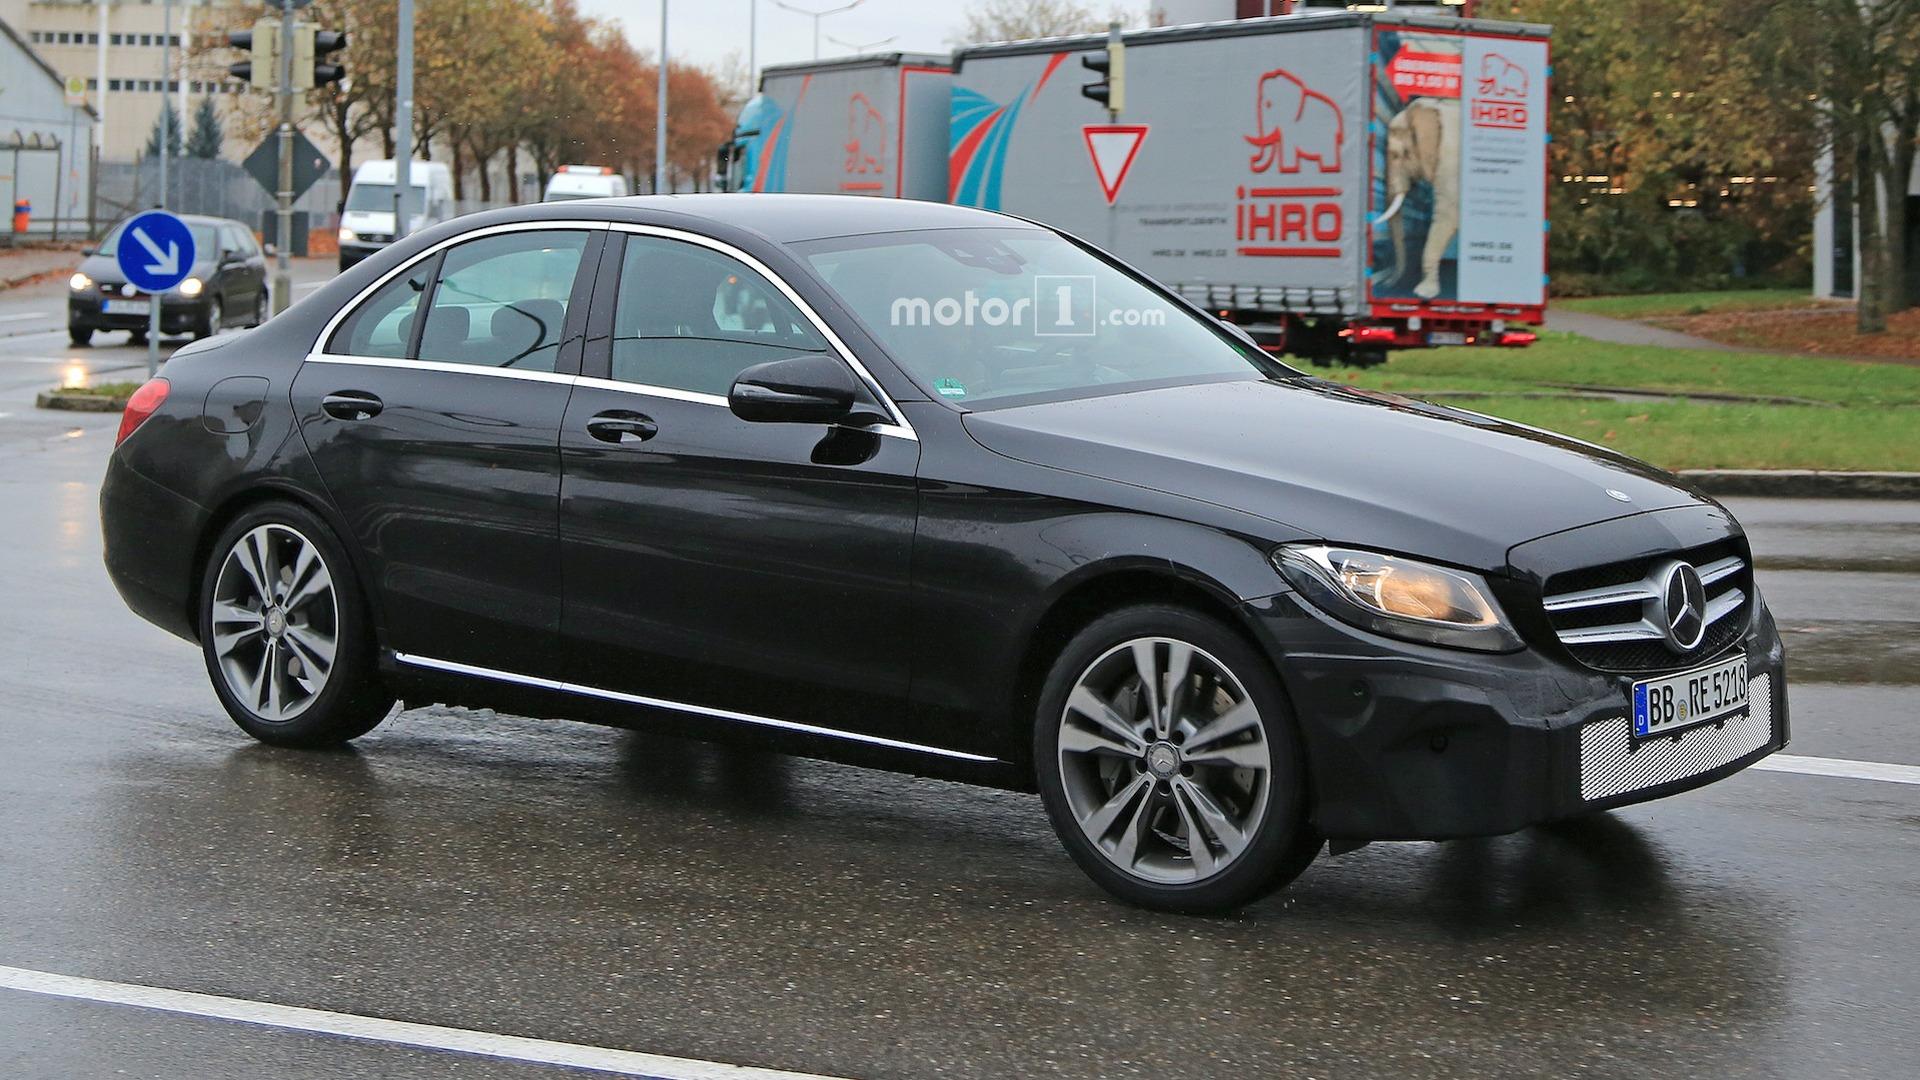 2018 mercedes benz c class freshens up in new spy shots for Mercedes benz usa website